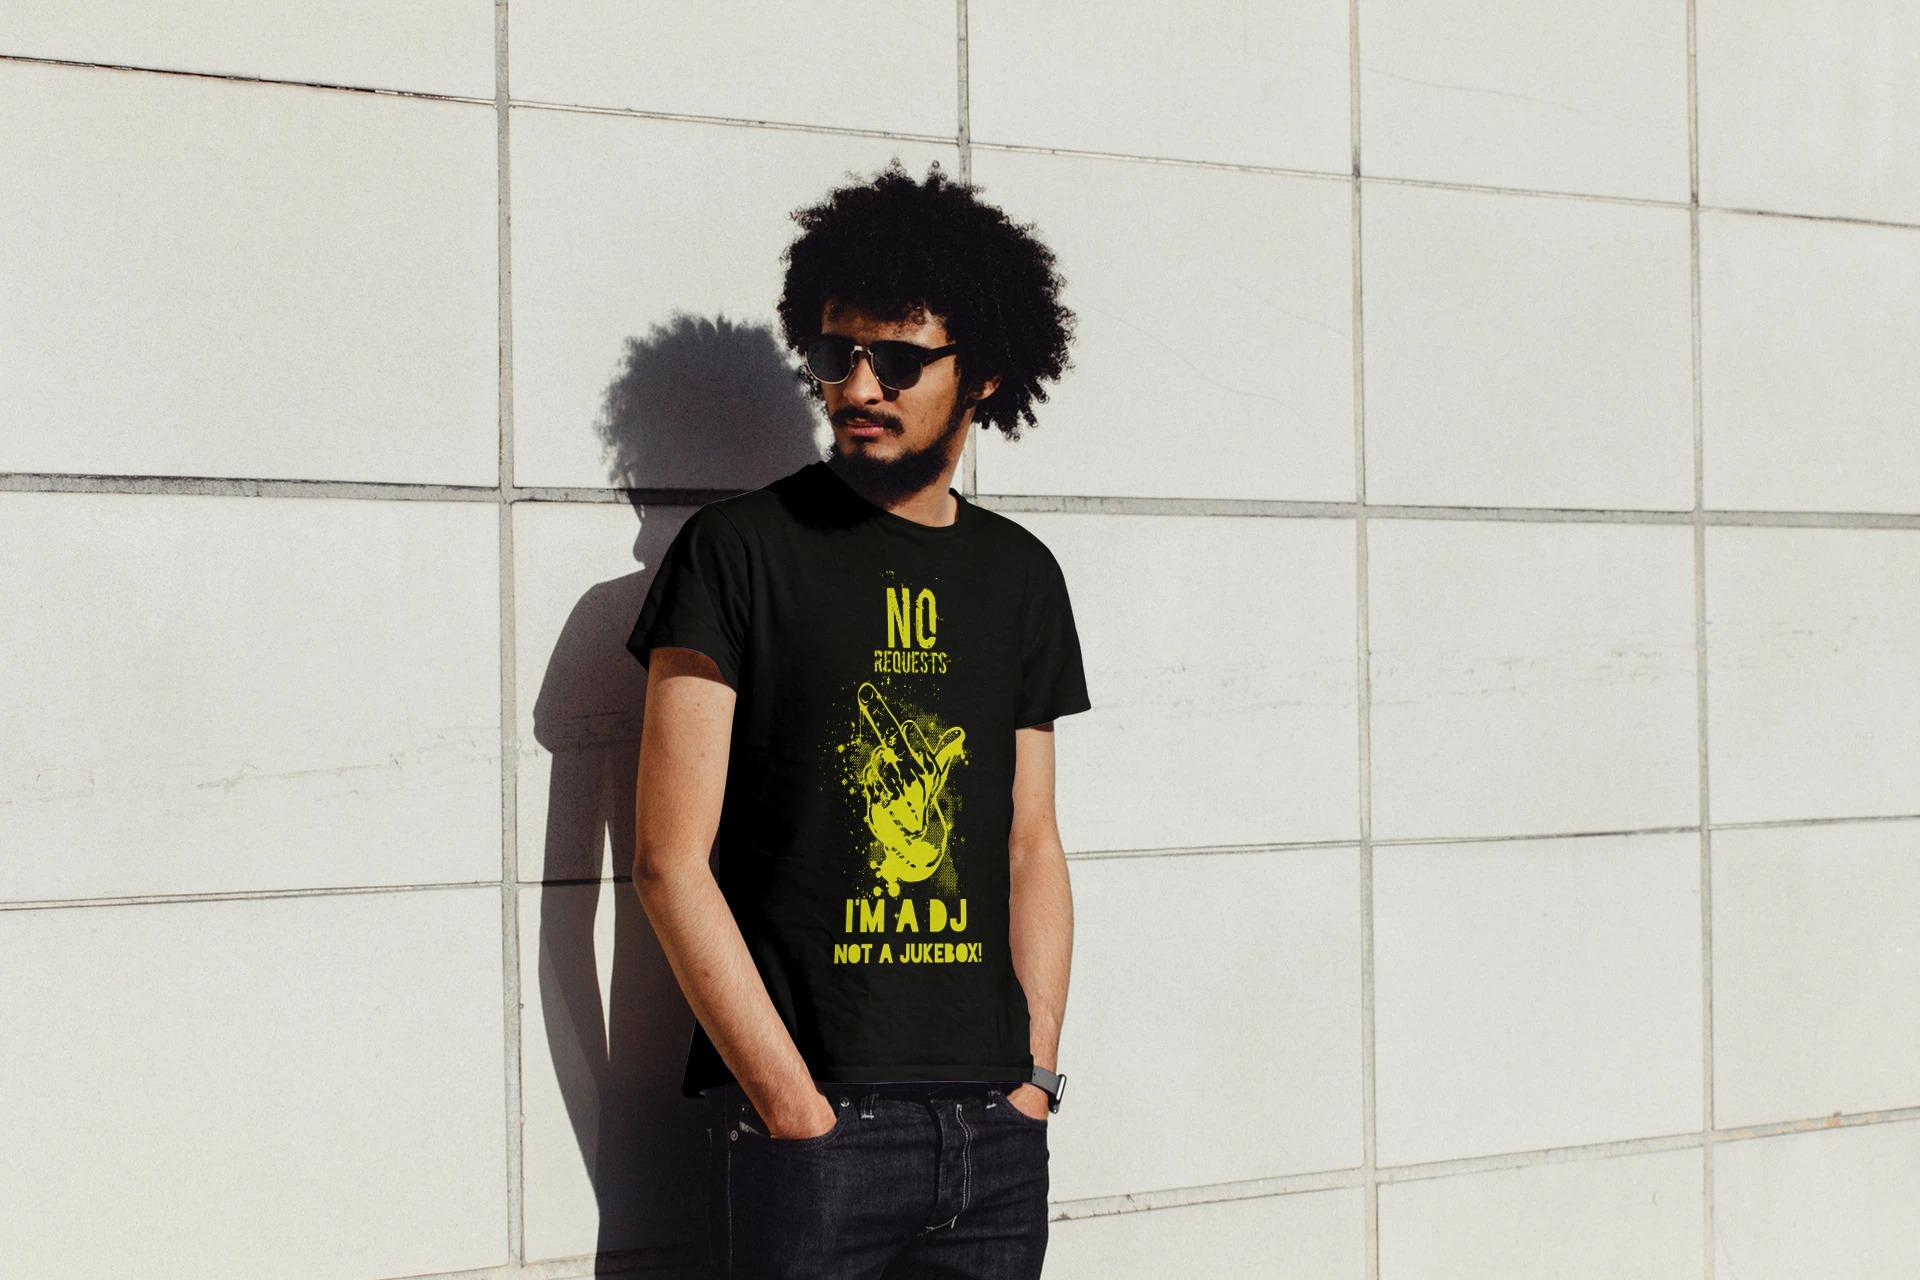 dj-not-jukebox-yellow-t-shirt